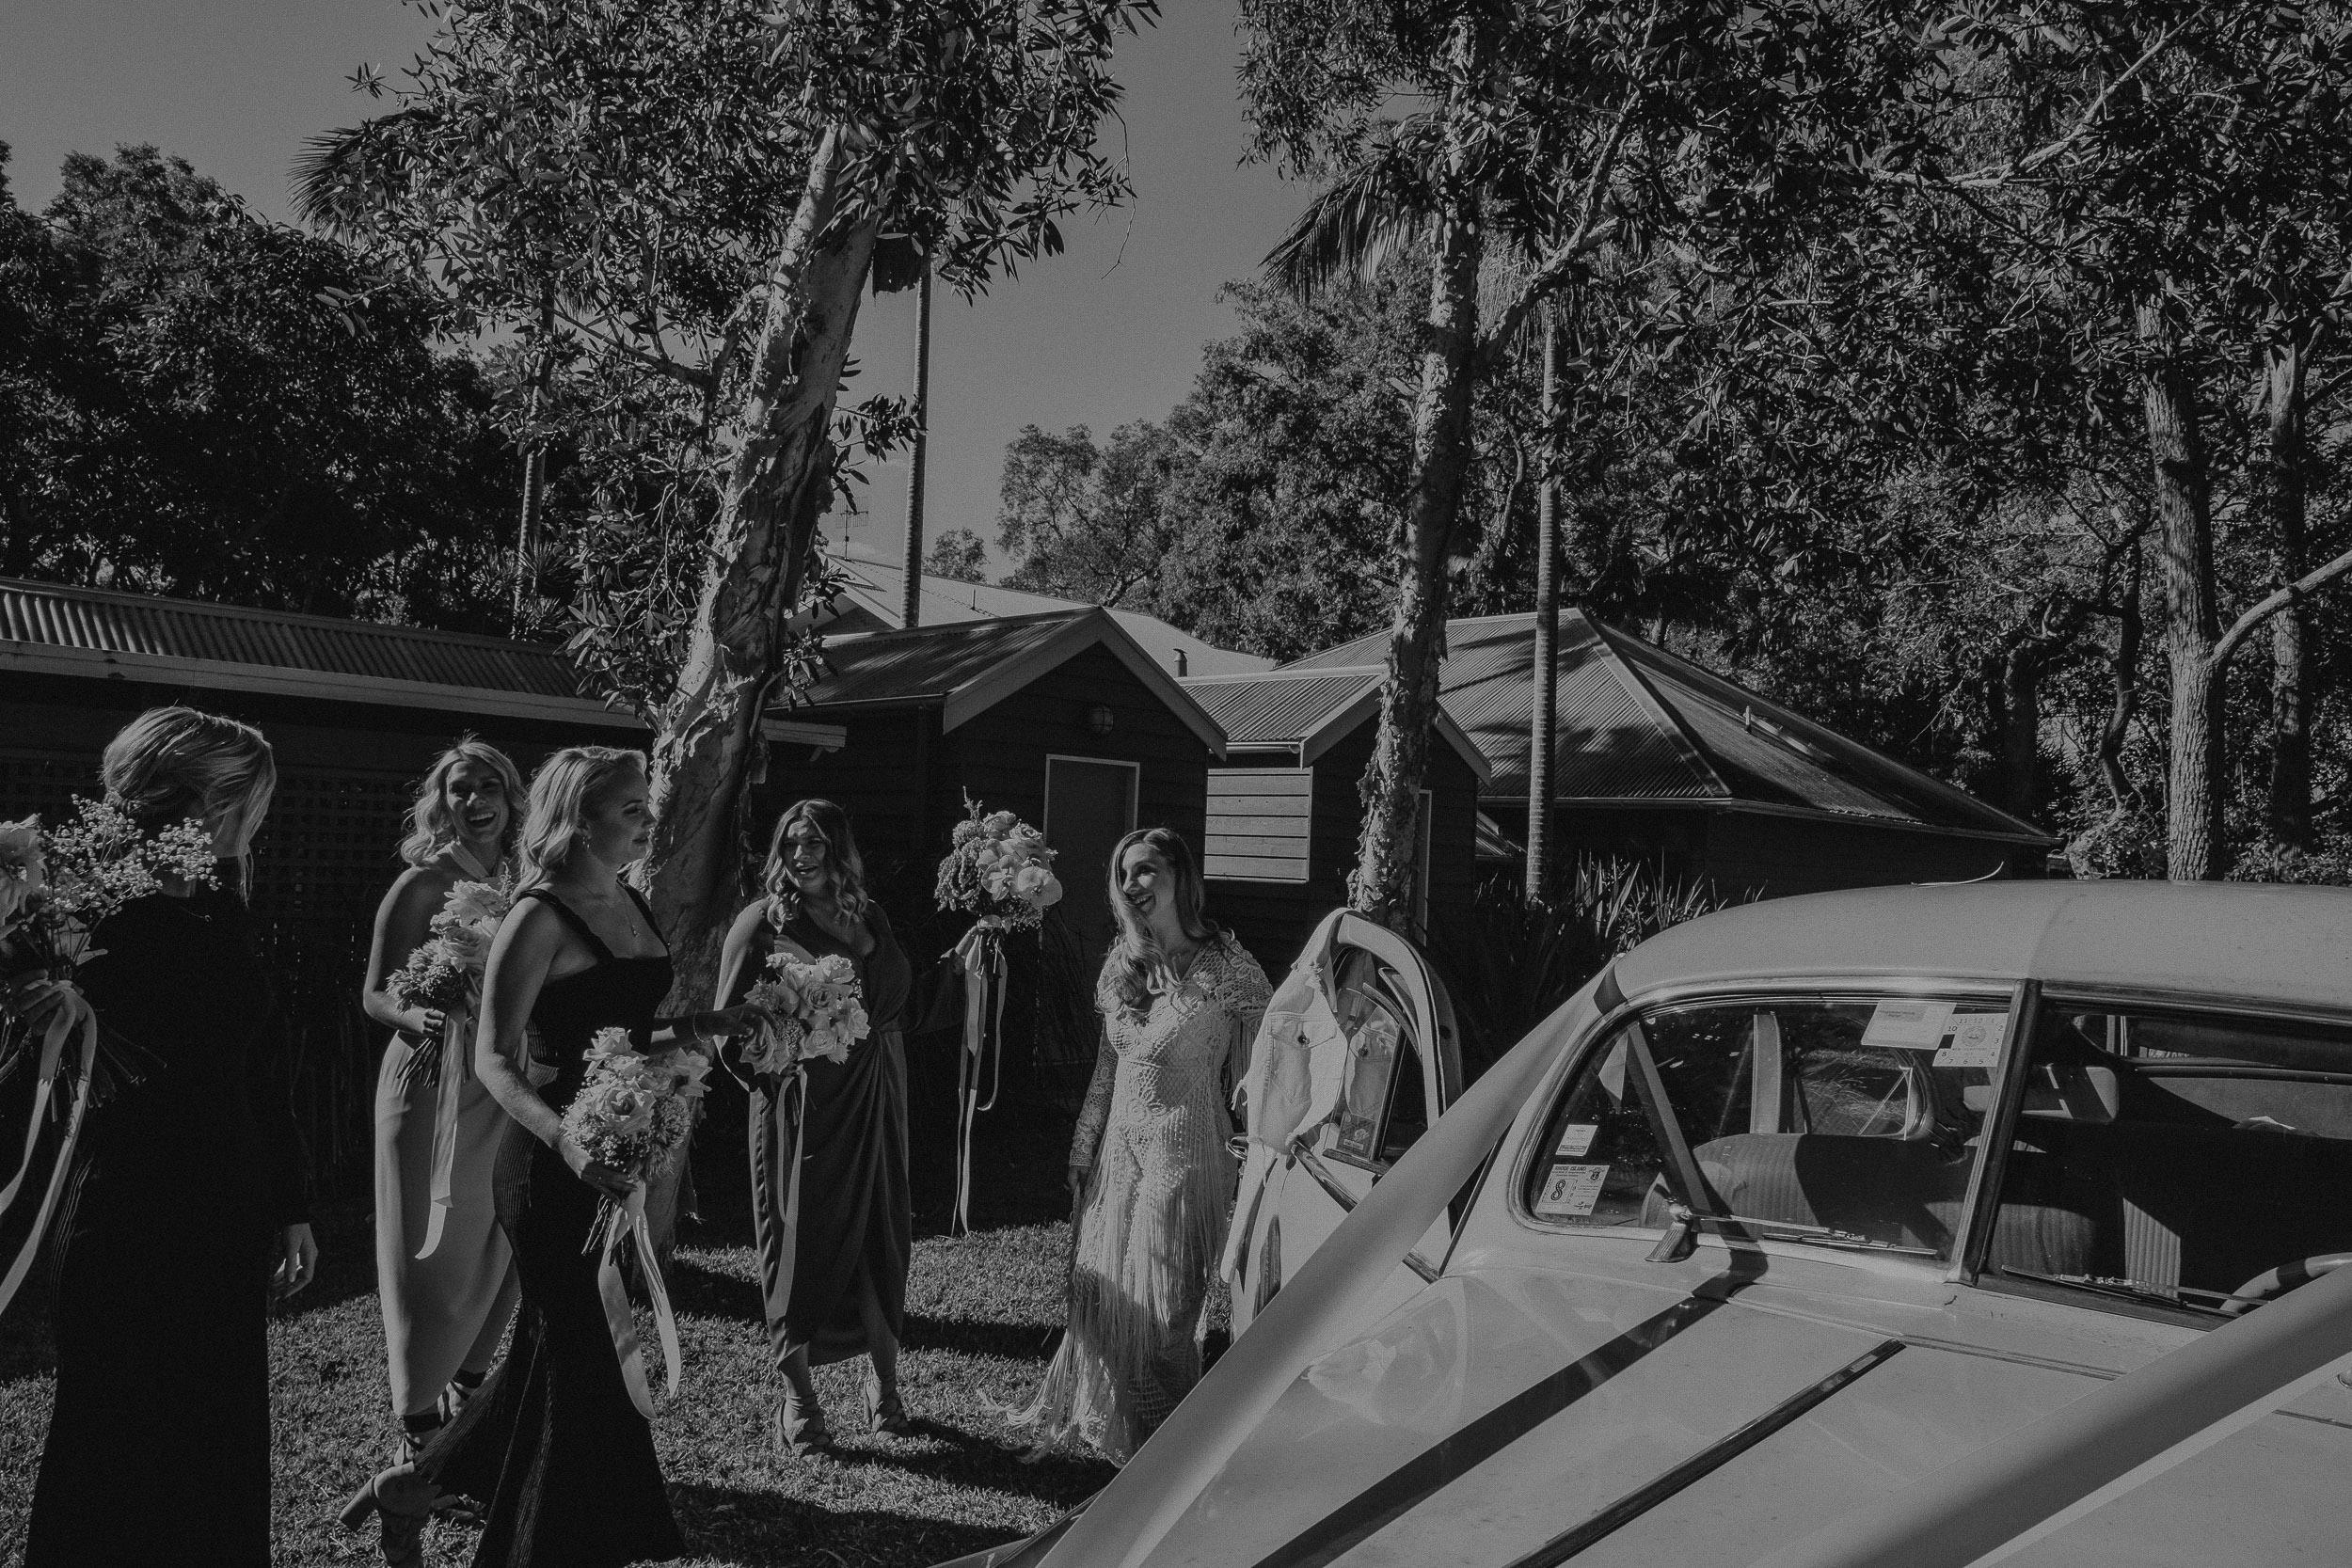 S&A Elopement - Kings & Thieves - Shred 'Til Dead - Central Coast Beach Forest Wedding - 122.jpg